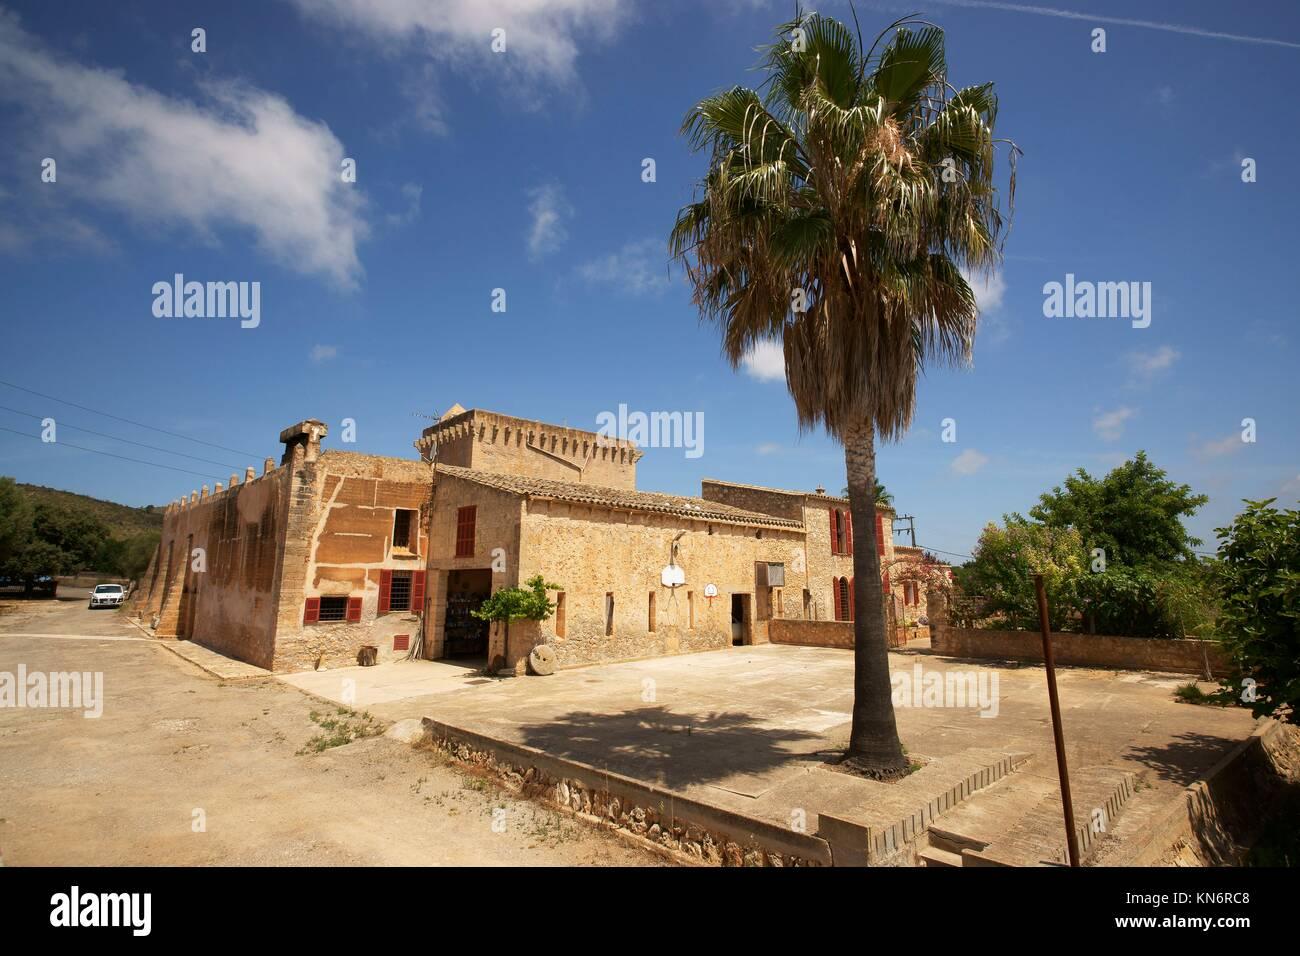 Casa fortificada de Son Forteza. Sant Llorenç des Cardassar. Majorca, Balearic Islands, Spain - Stock Image